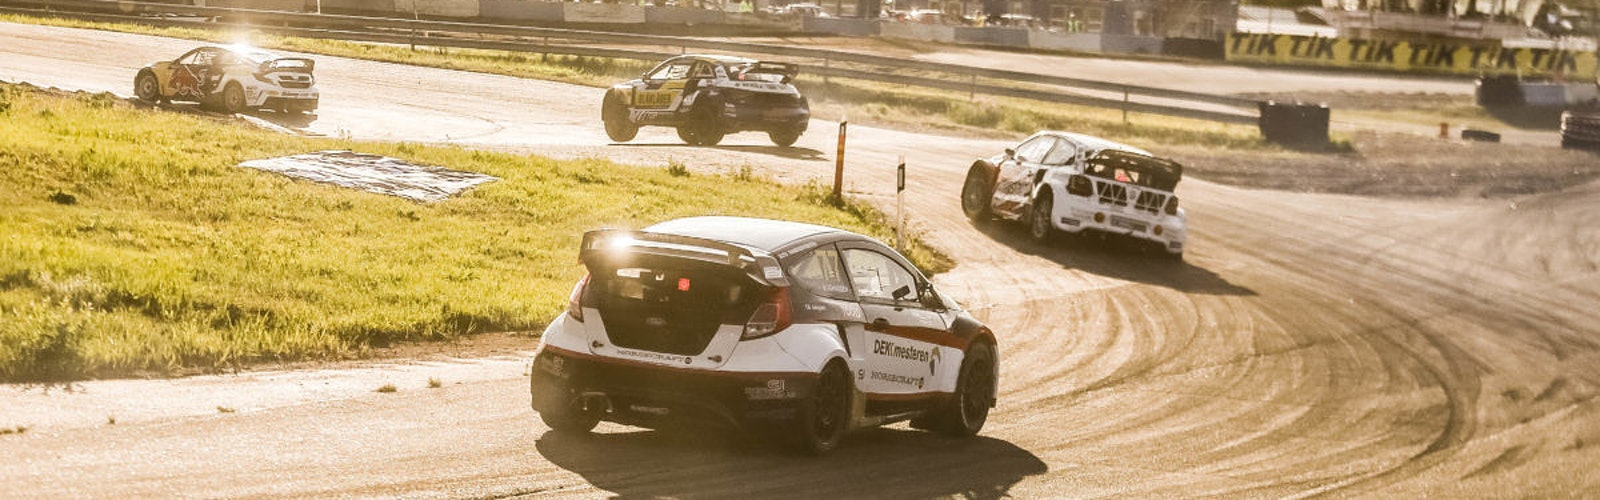 RallyX Nordic @ Kouvola, Round Six, 2019